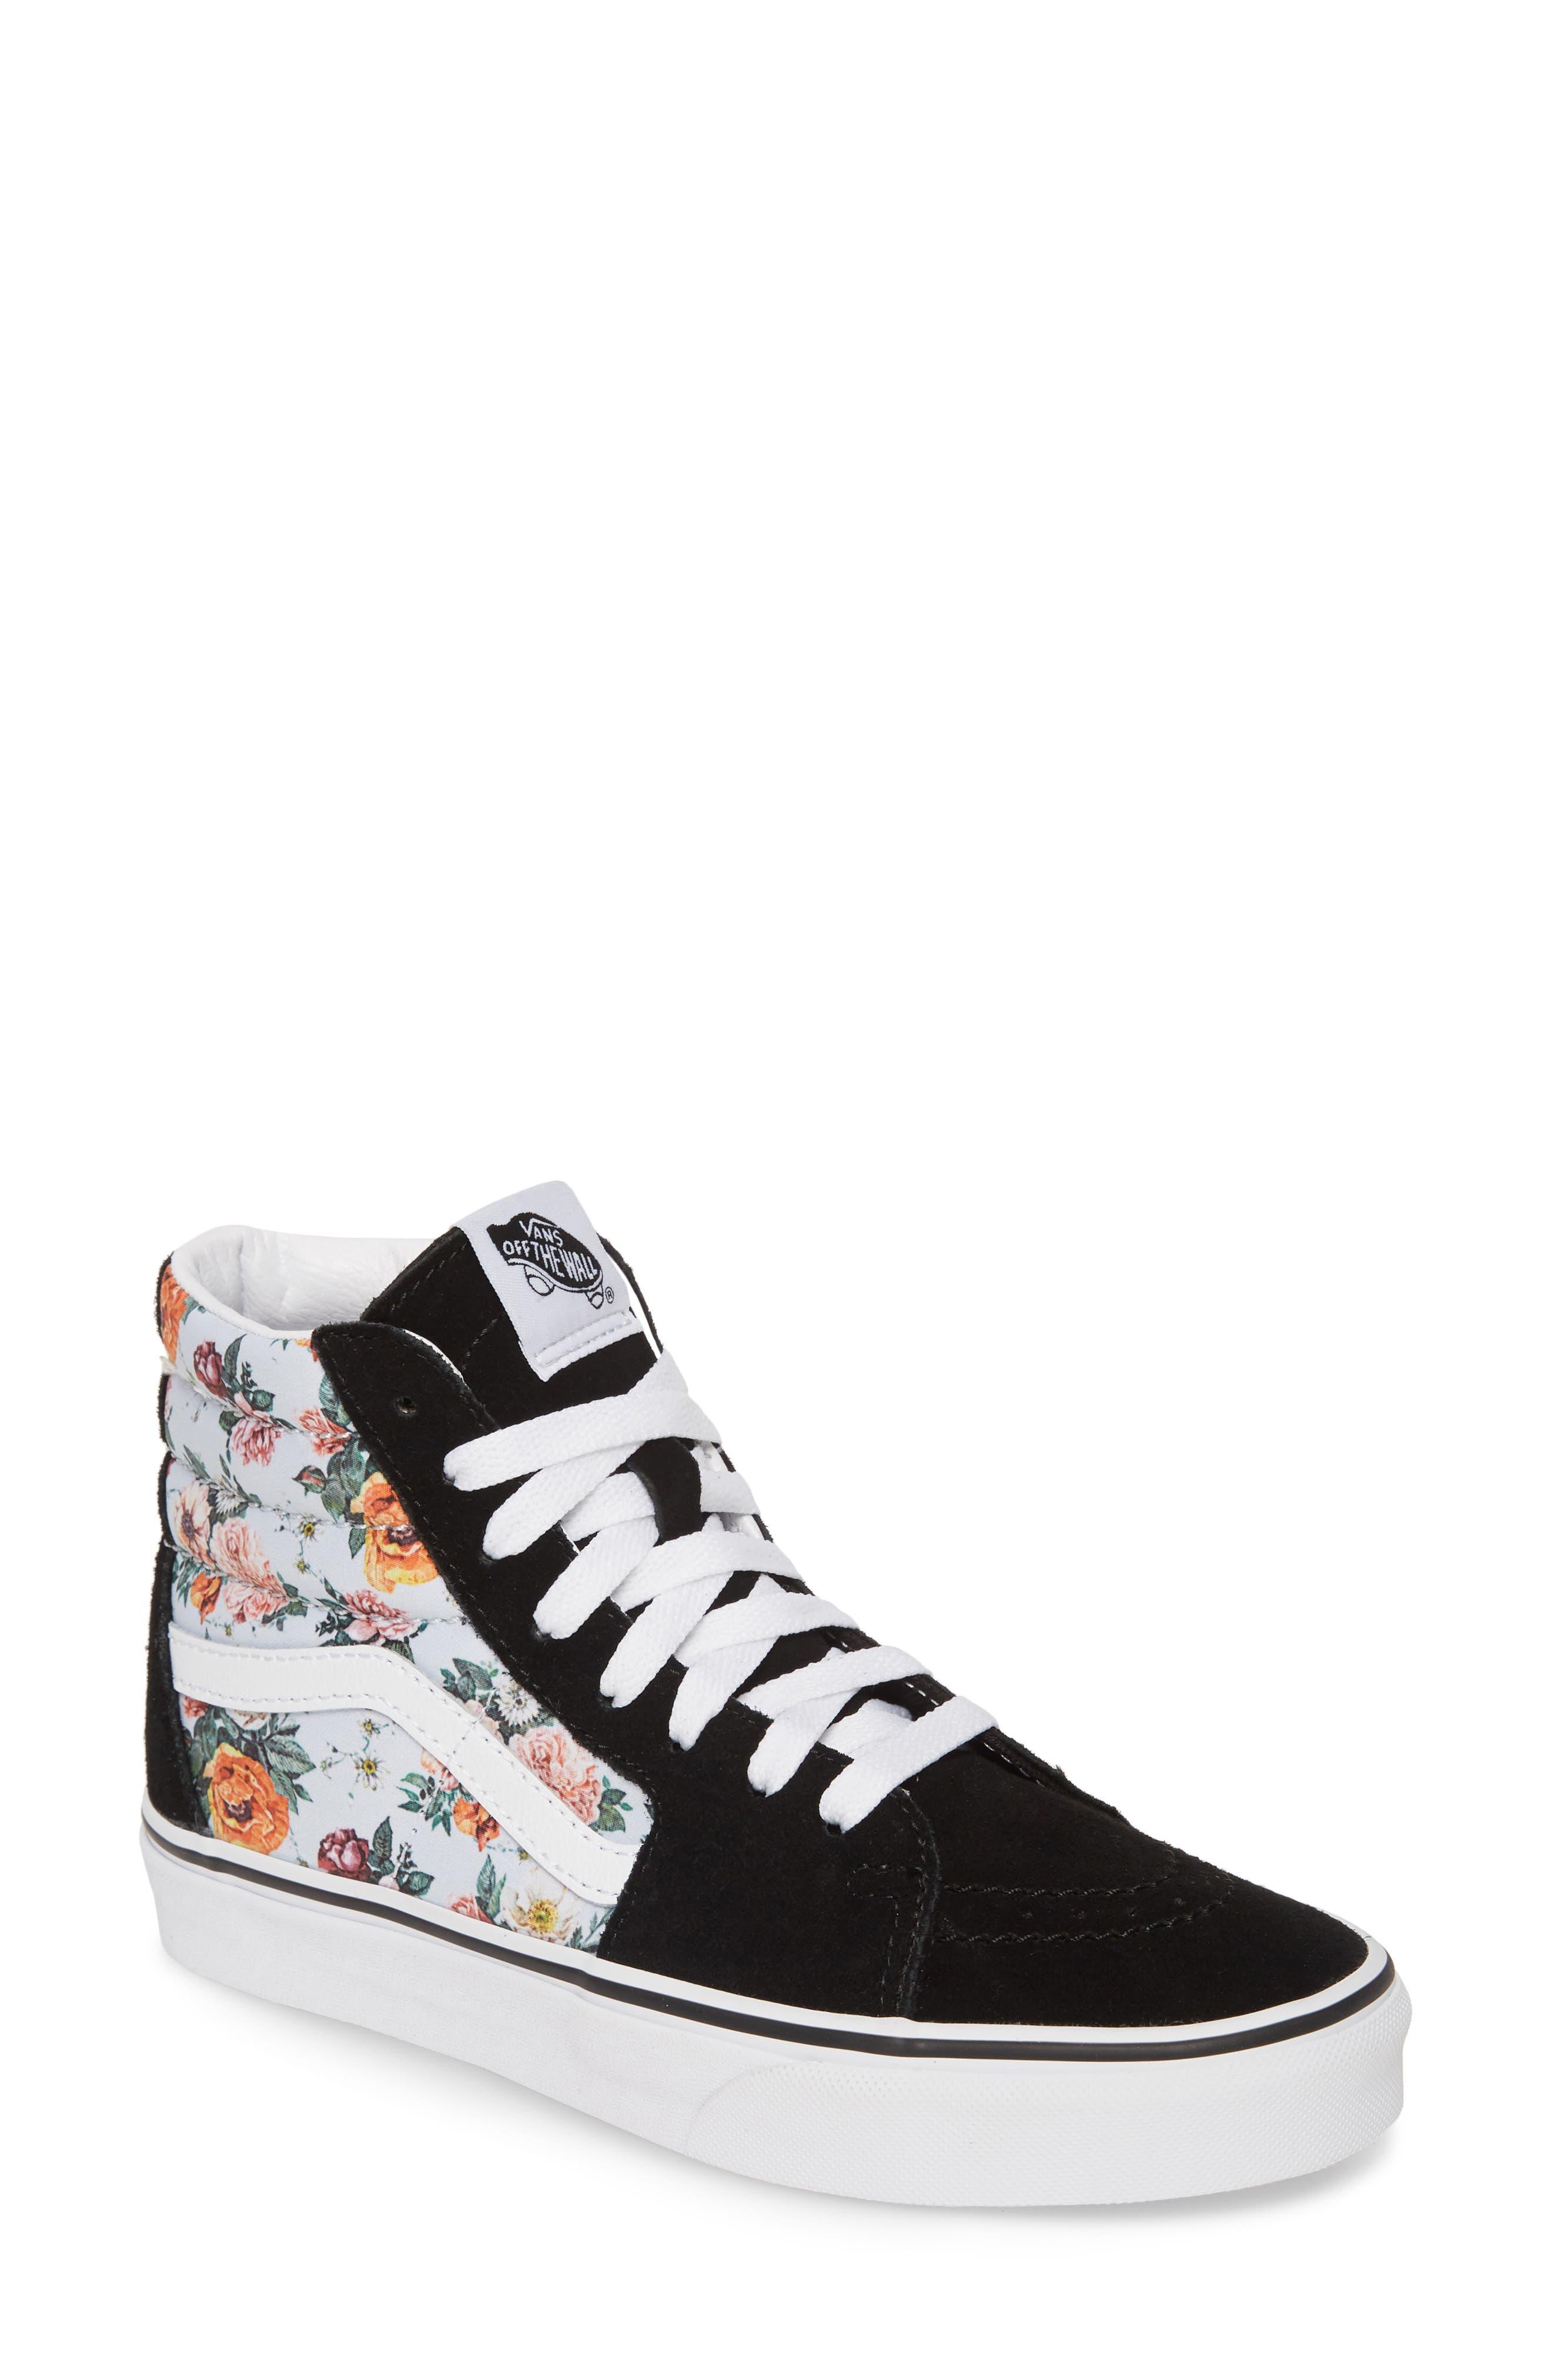 Vans Sk8-Hi Checker Floral High Top Sneaker